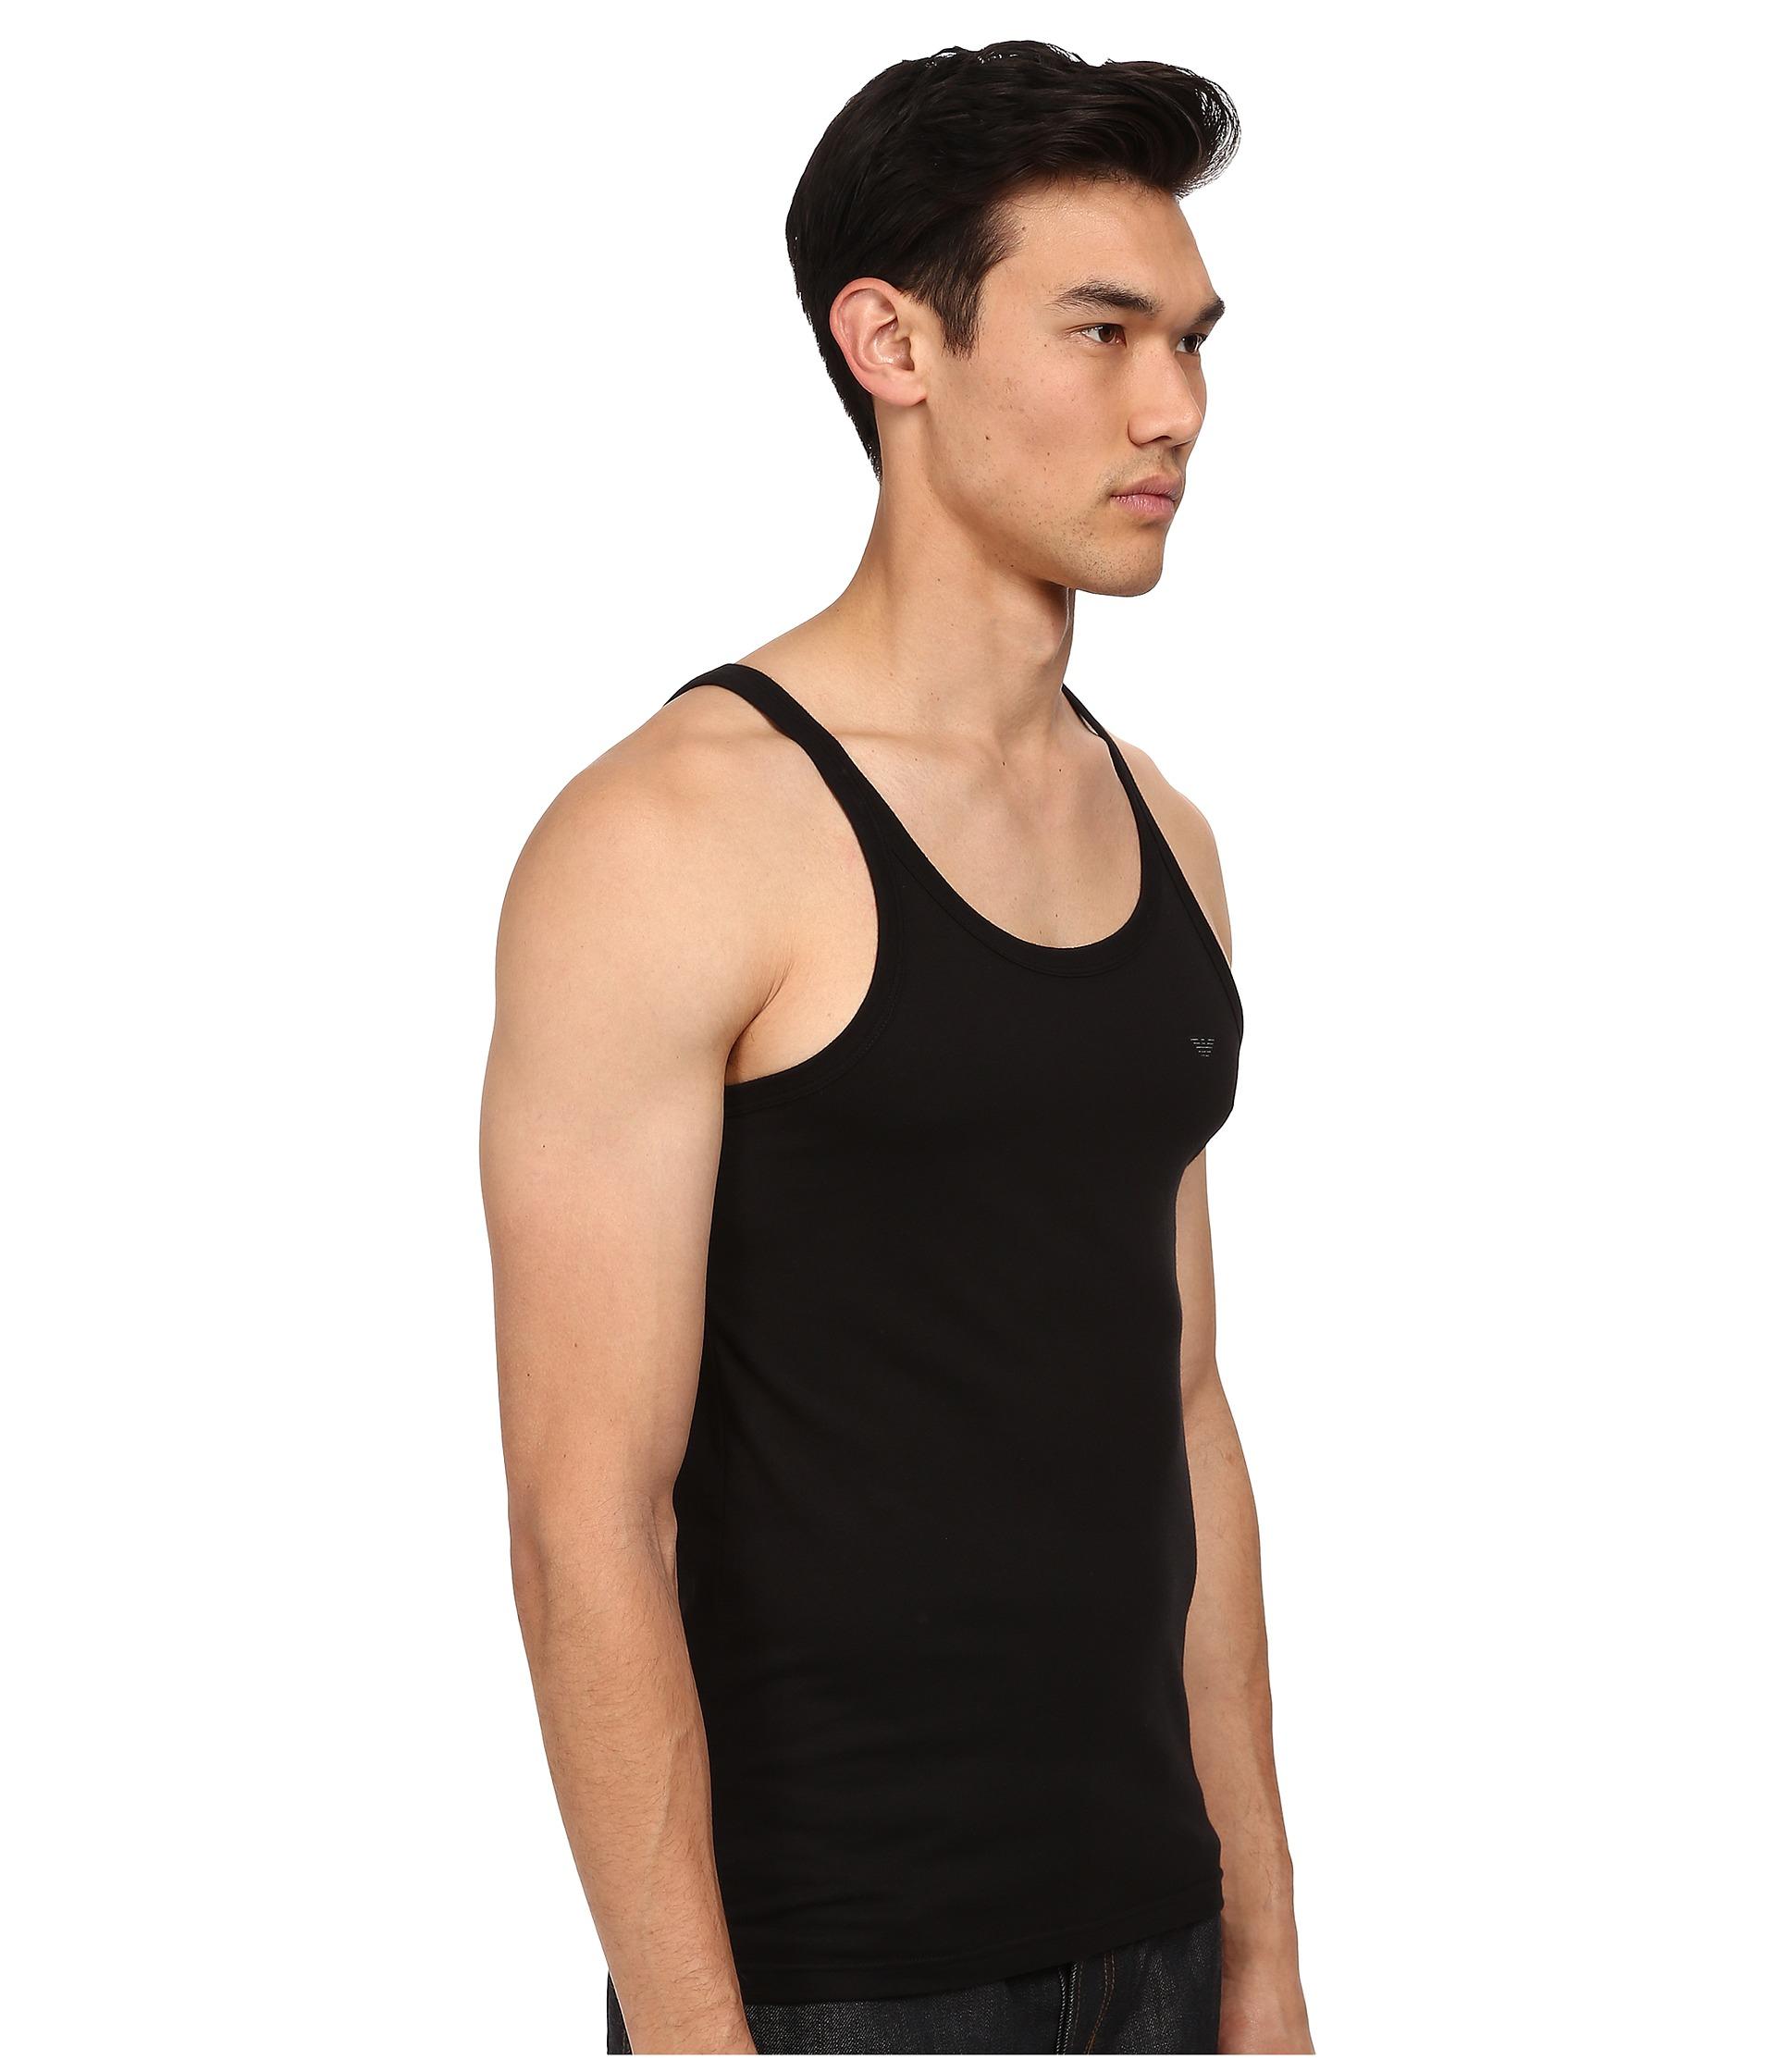 7ba2e7bb28d83 Lyst - Emporio Armani 3-pack Cotton Tank Top in Black for Men